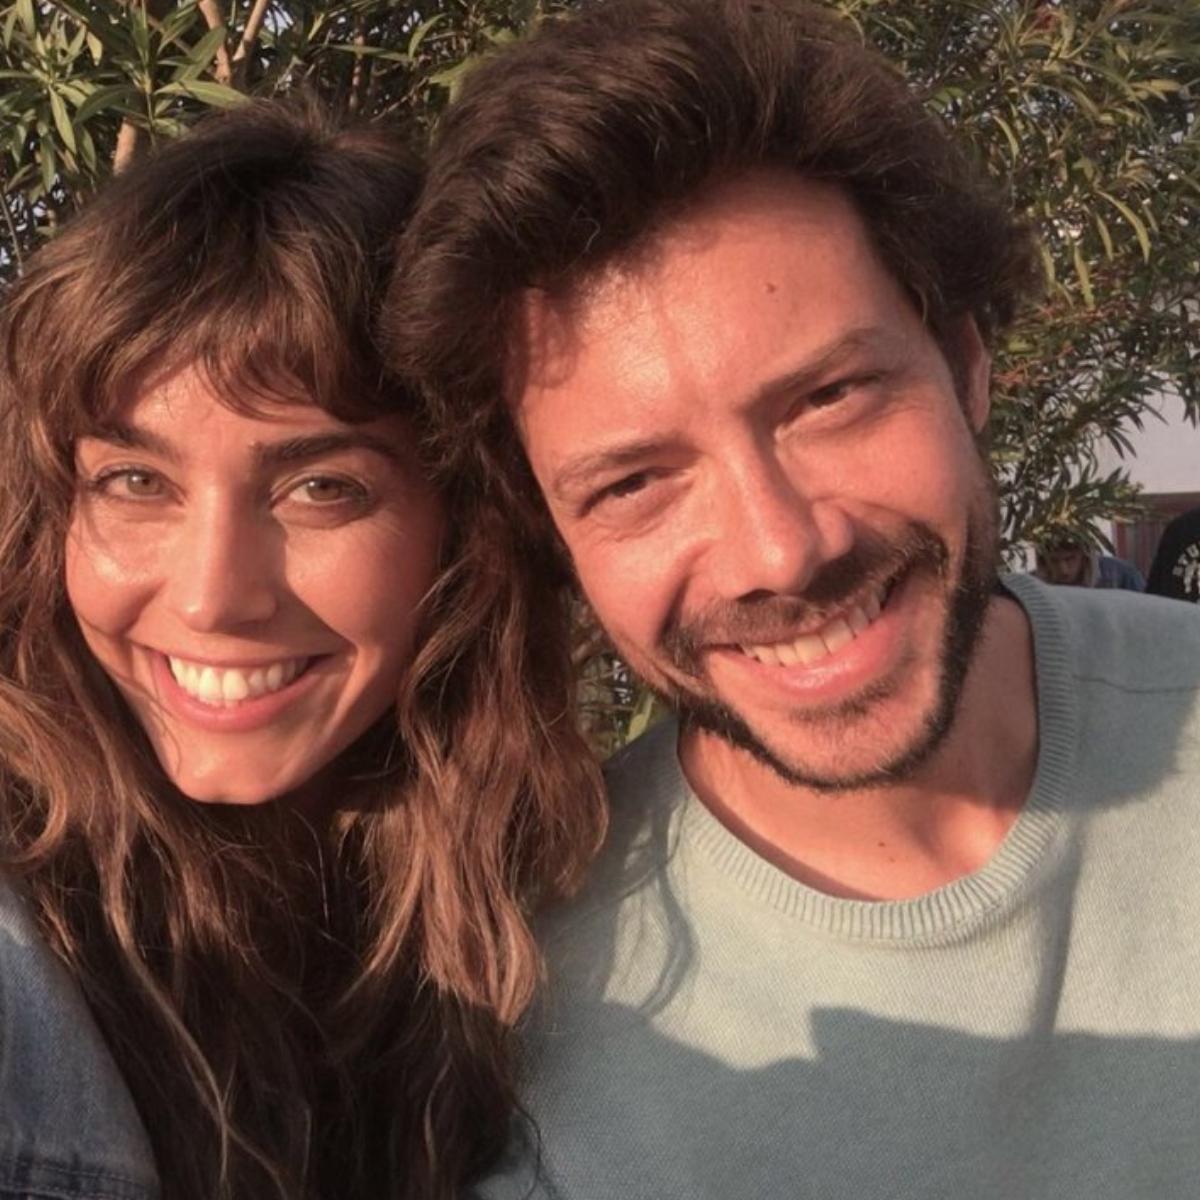 Money Heist actor Alvaro Morte and wife Blanca Clemente take a selfie.